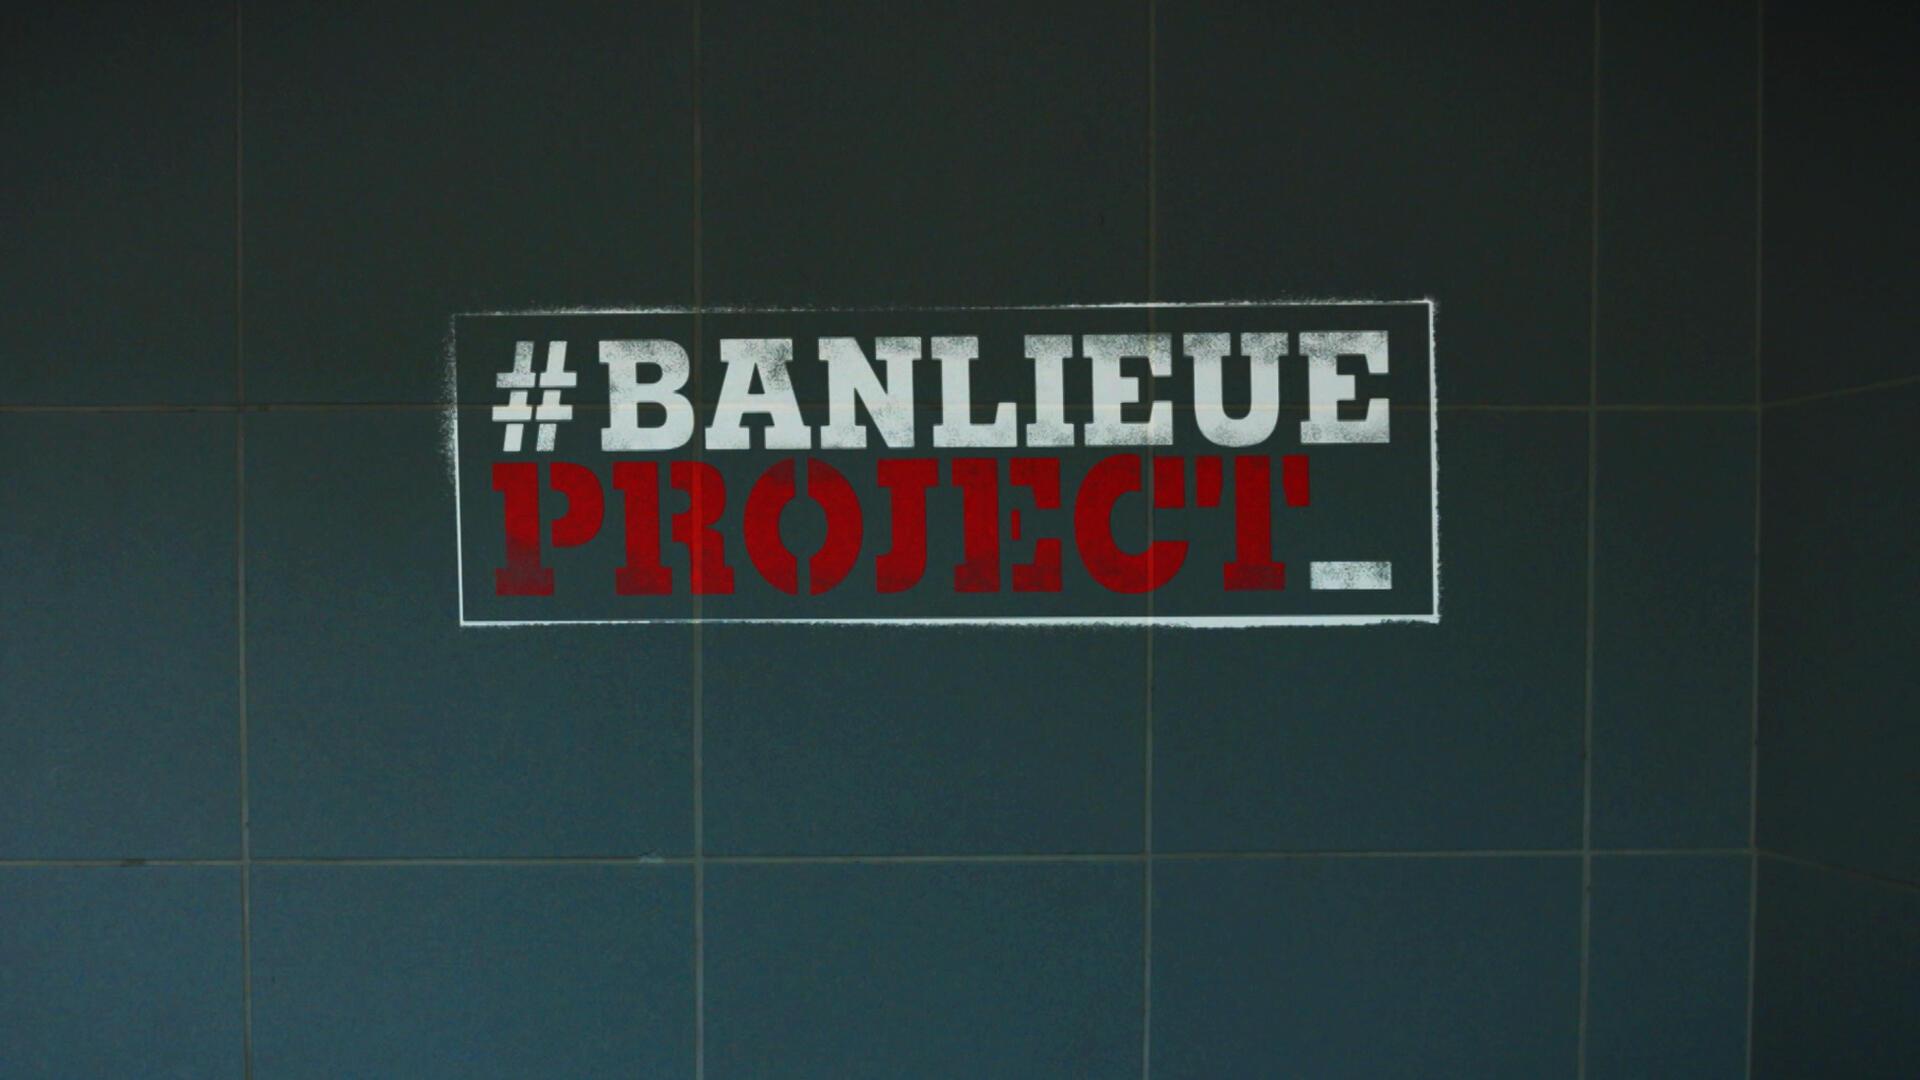 BANLIEUE PROJECT